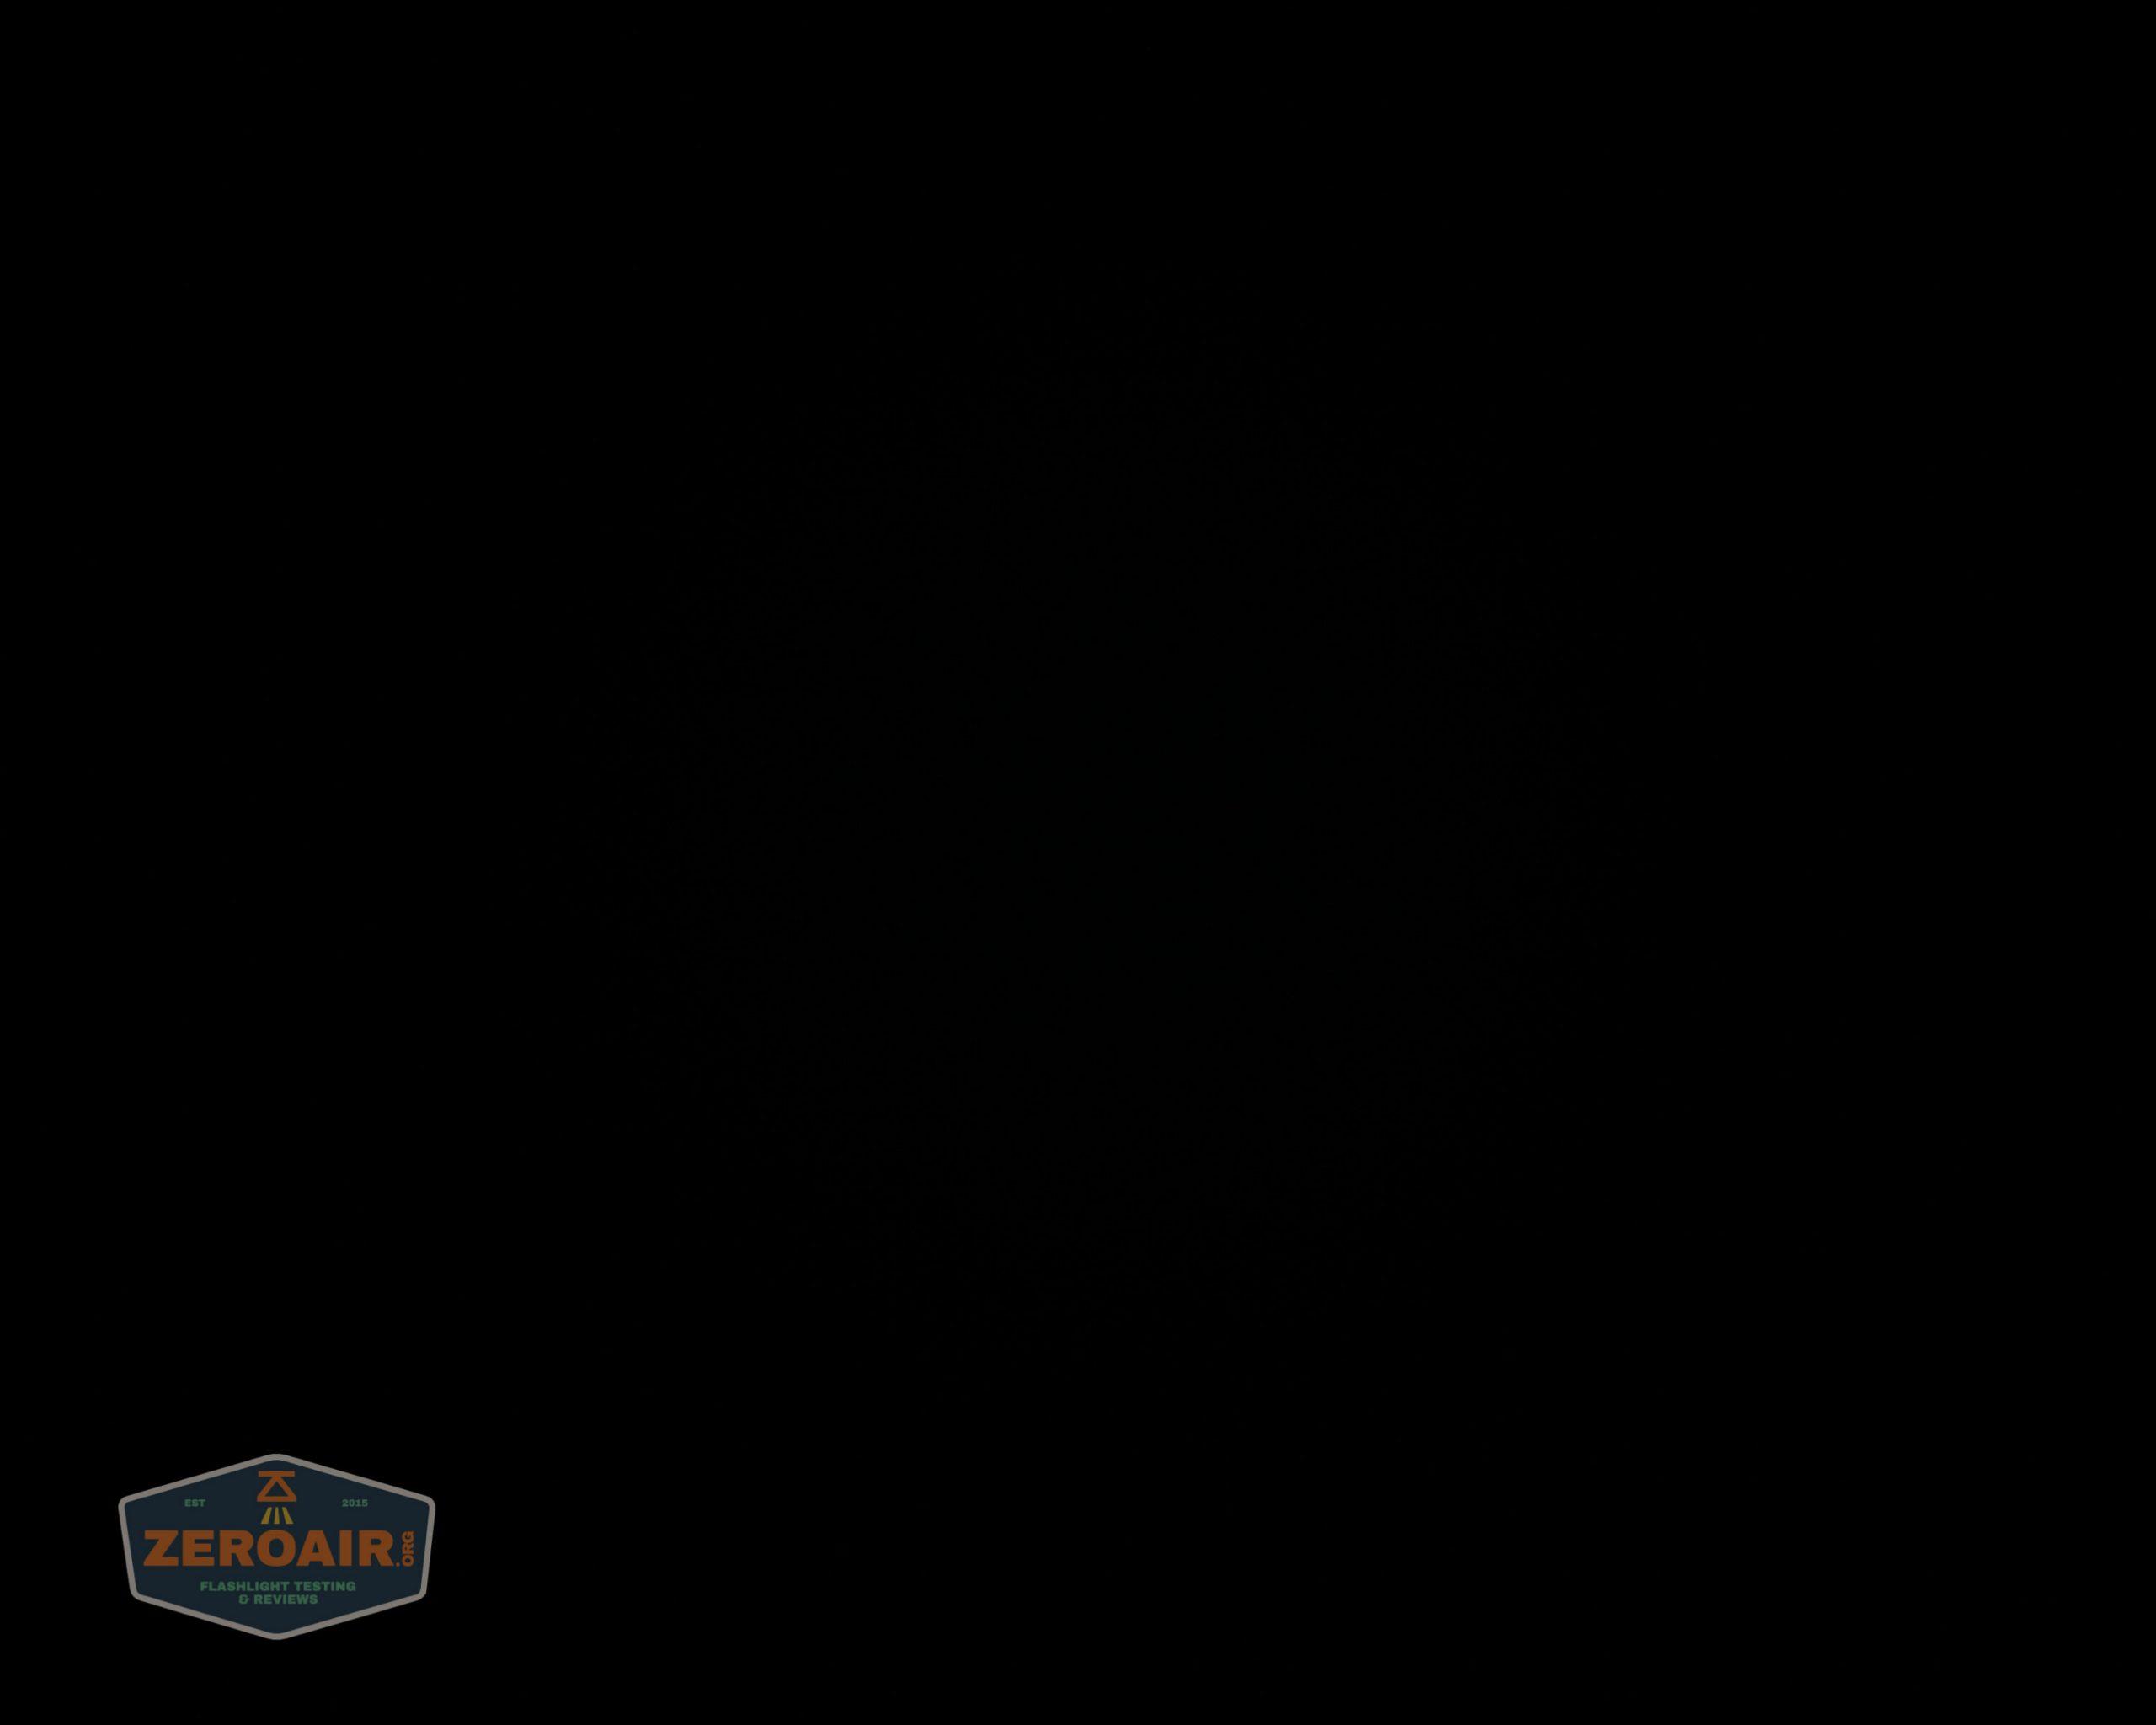 klarus g25 21700 cree xhp70.2 flashlight beamshot ceilinglowest